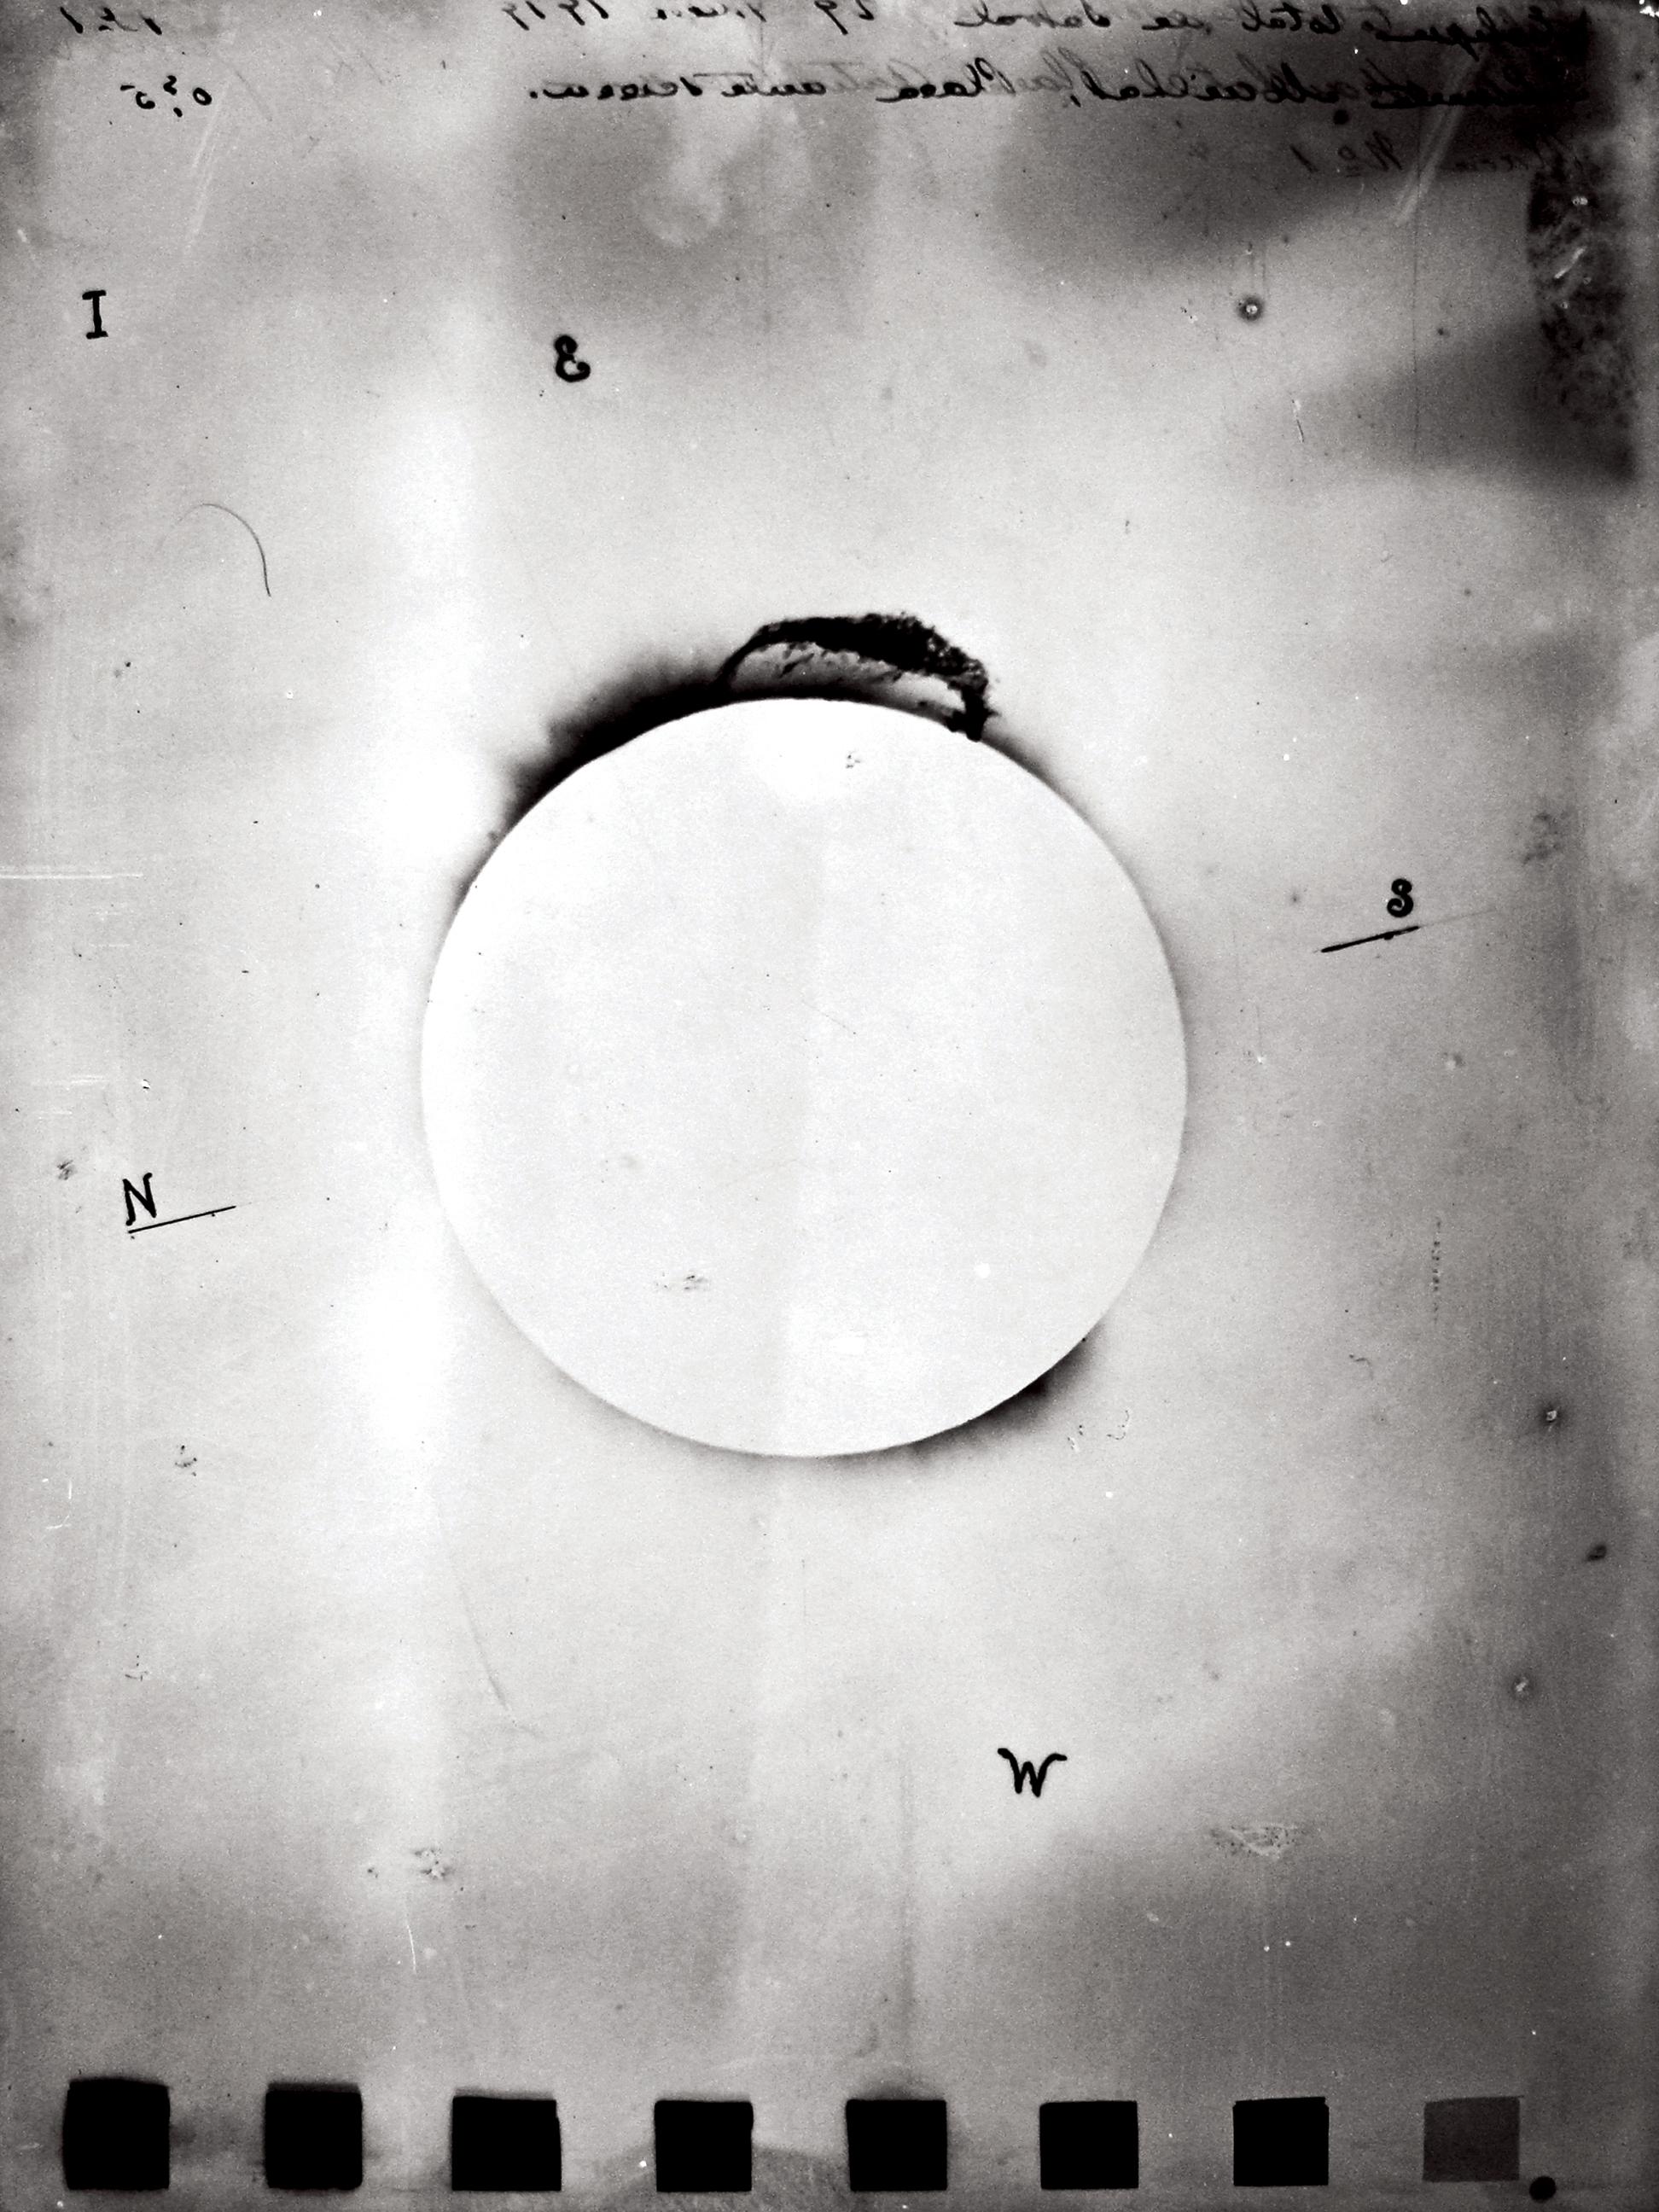 sobral_eclipse_06